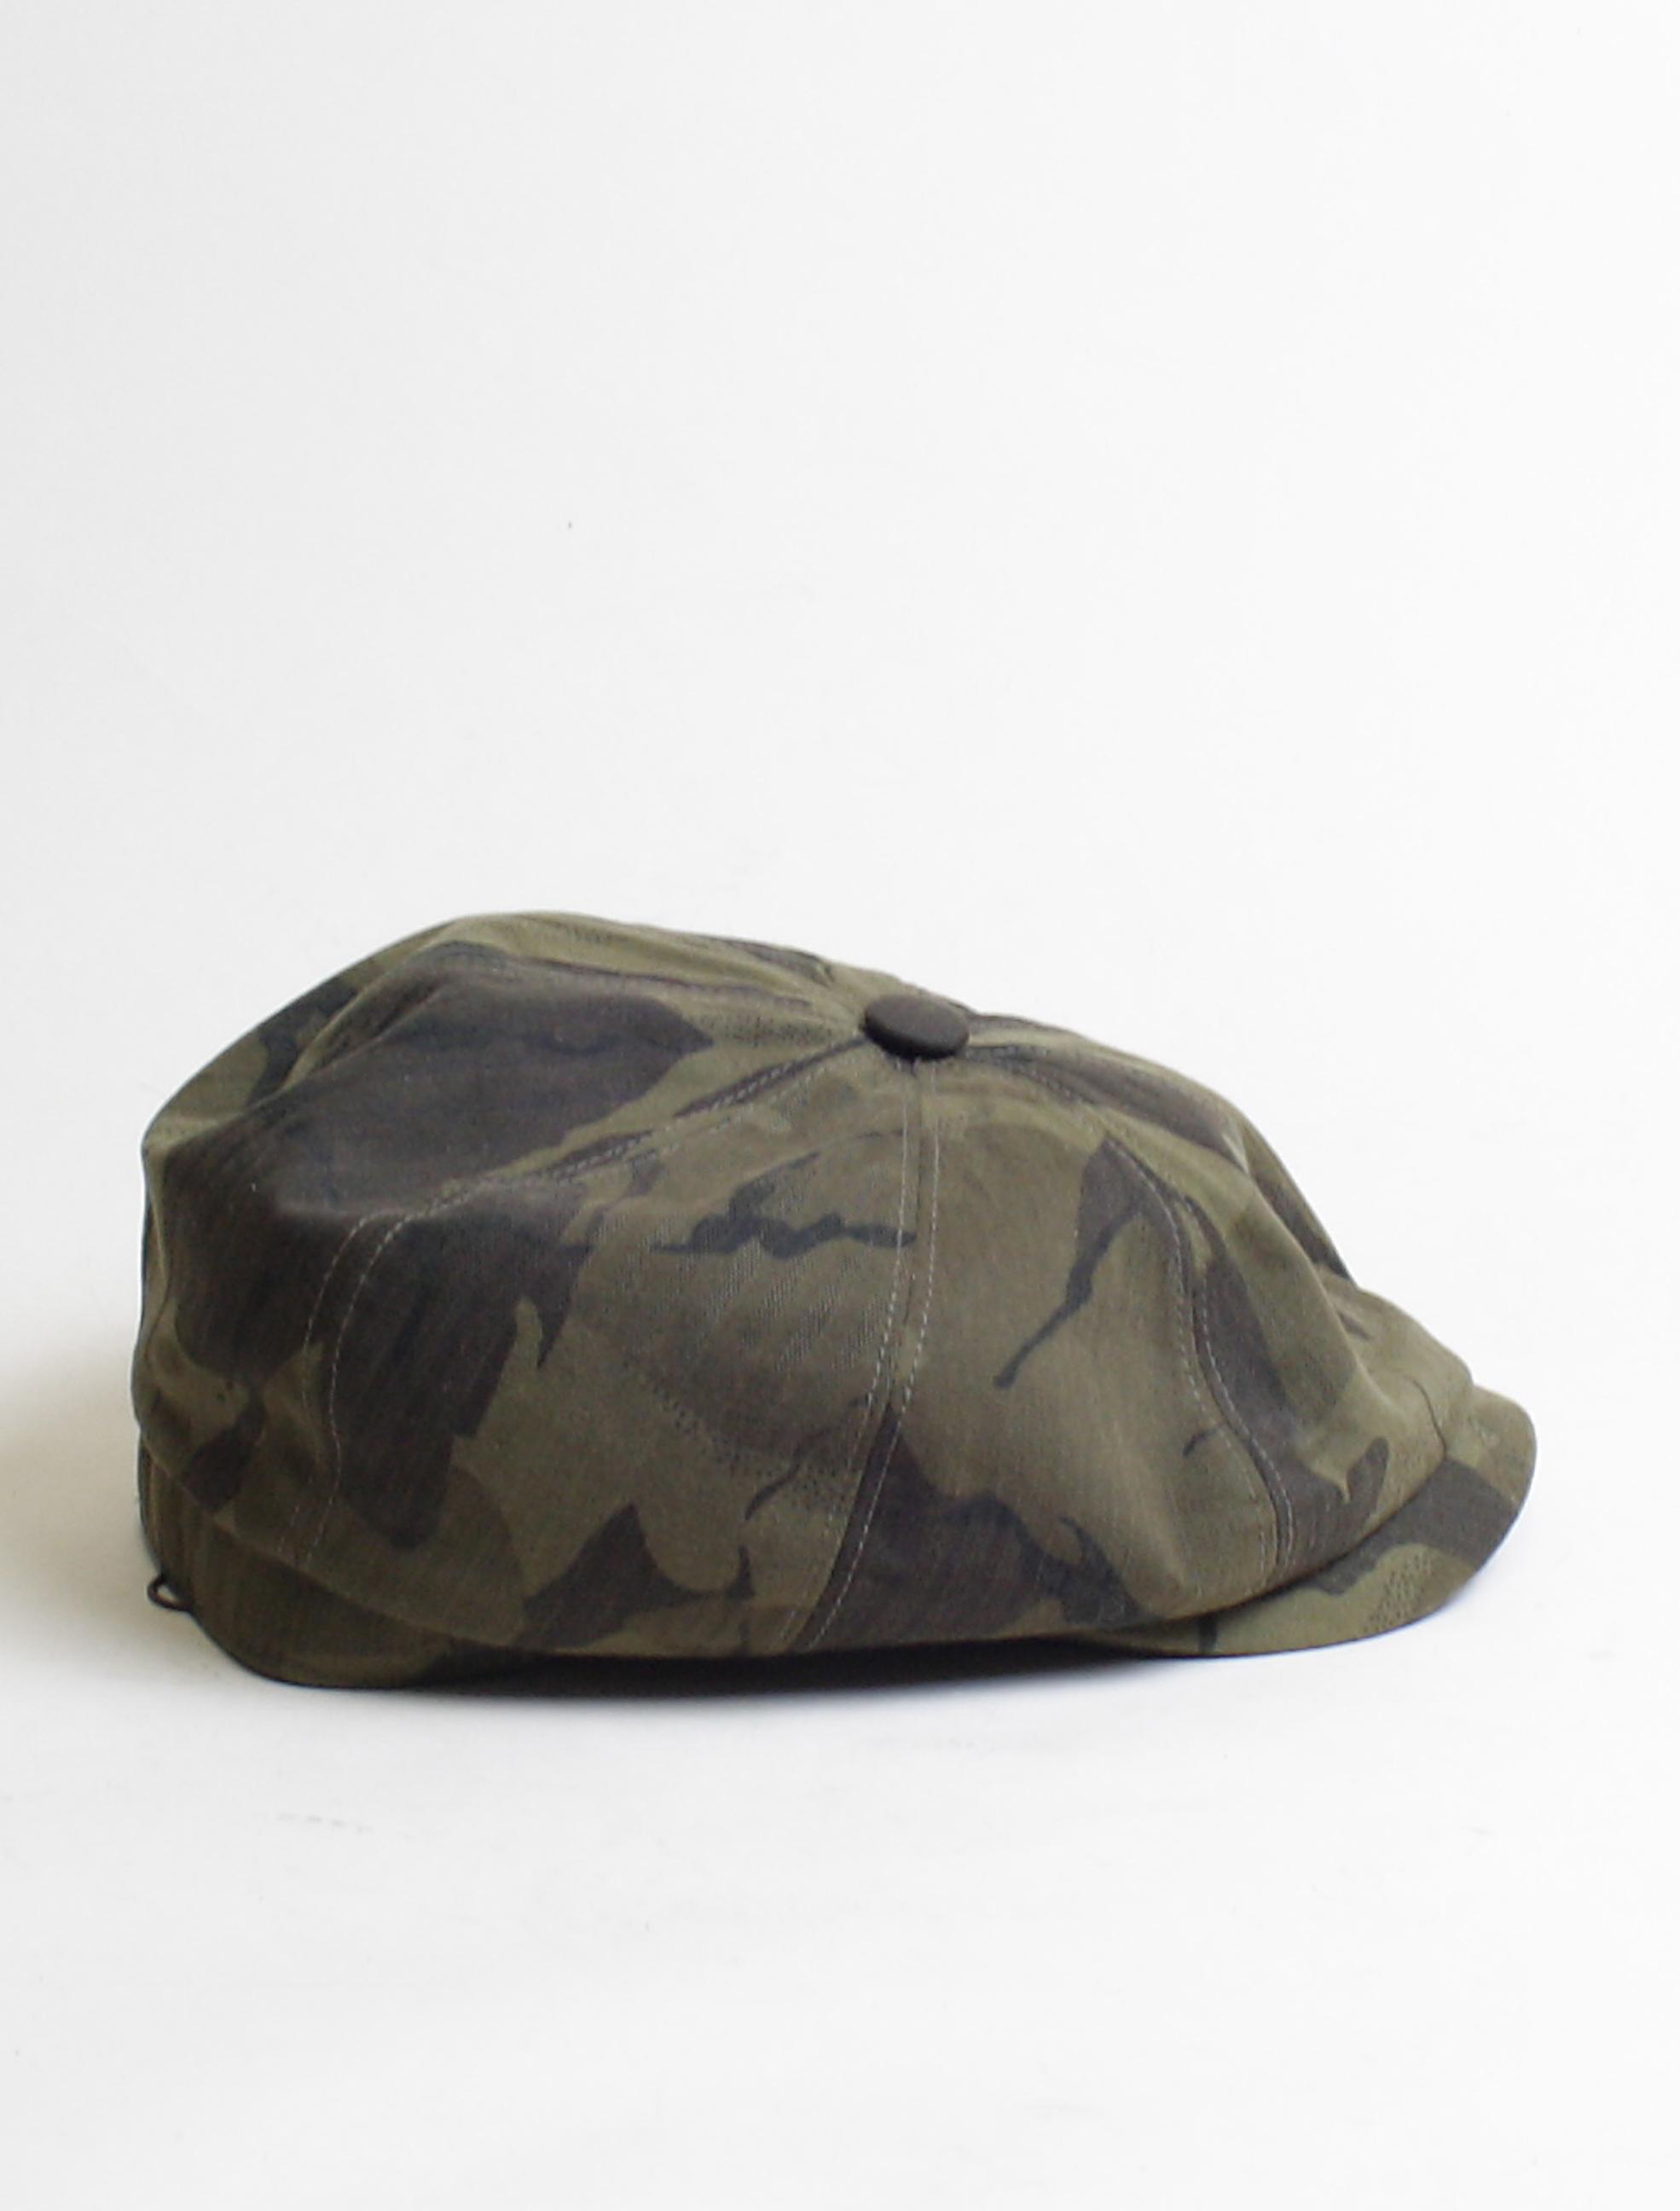 Stetson hatteras waxed cotton camouflage 56 sonstige